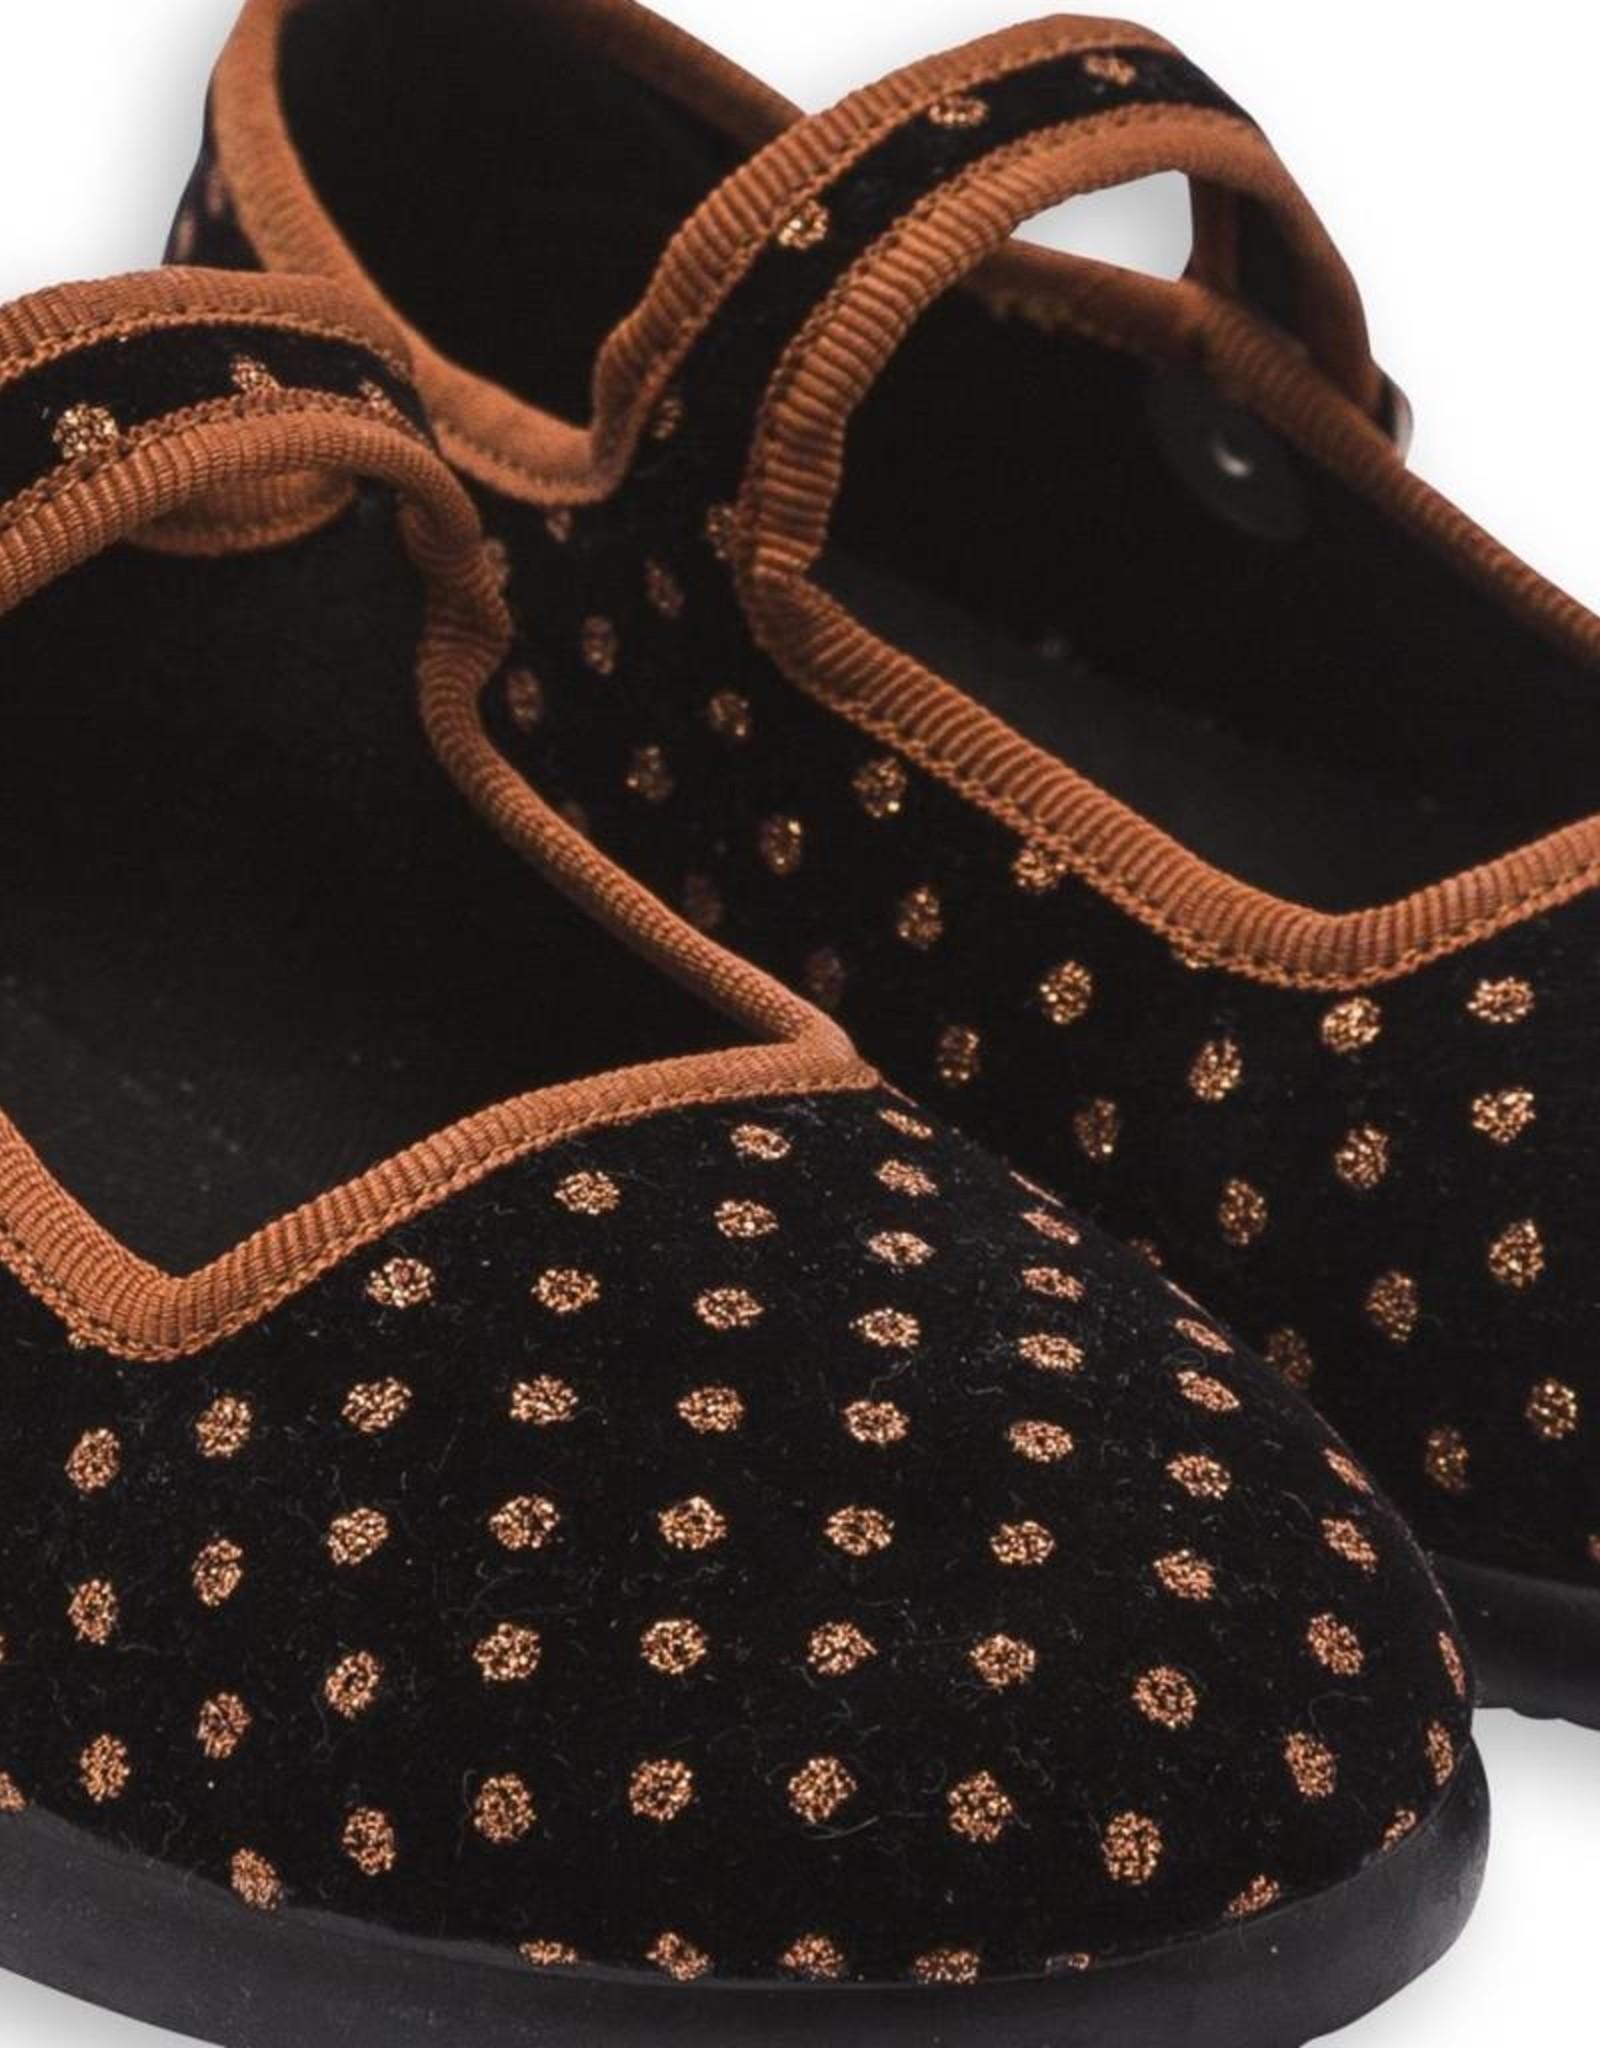 Bonton Kid's Jane sling shoes, polka dots print